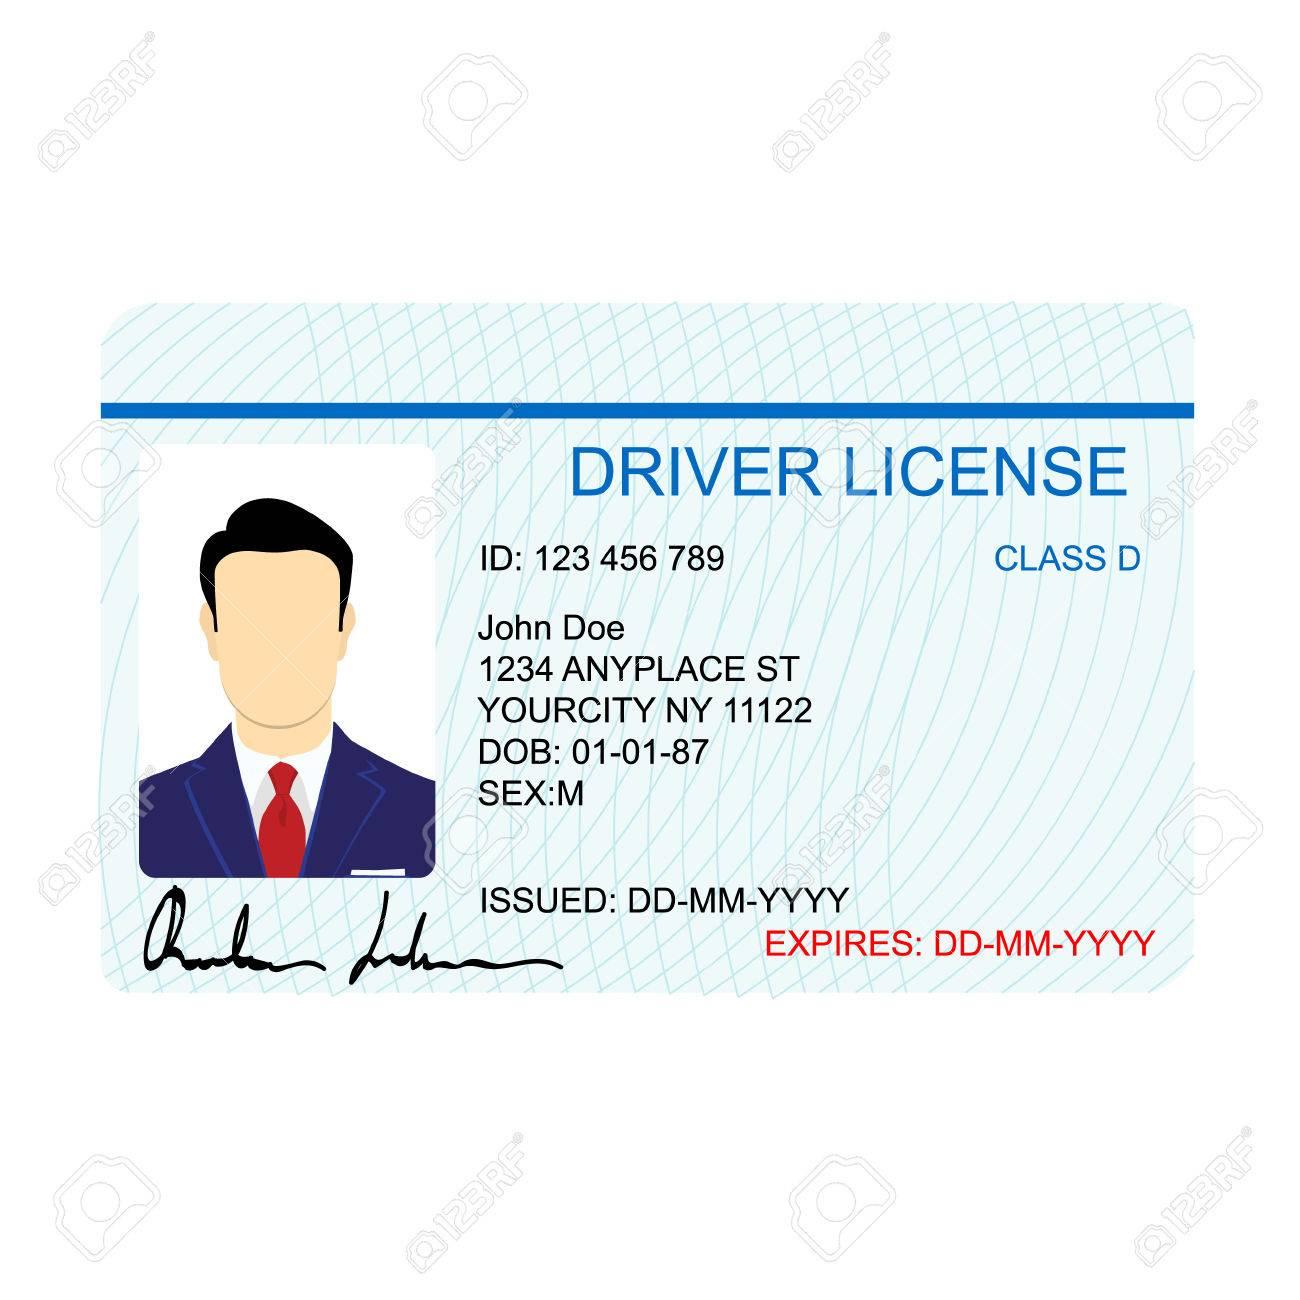 Driver License Template | Vector Illustration Man Driver License Card Template Royalty Free